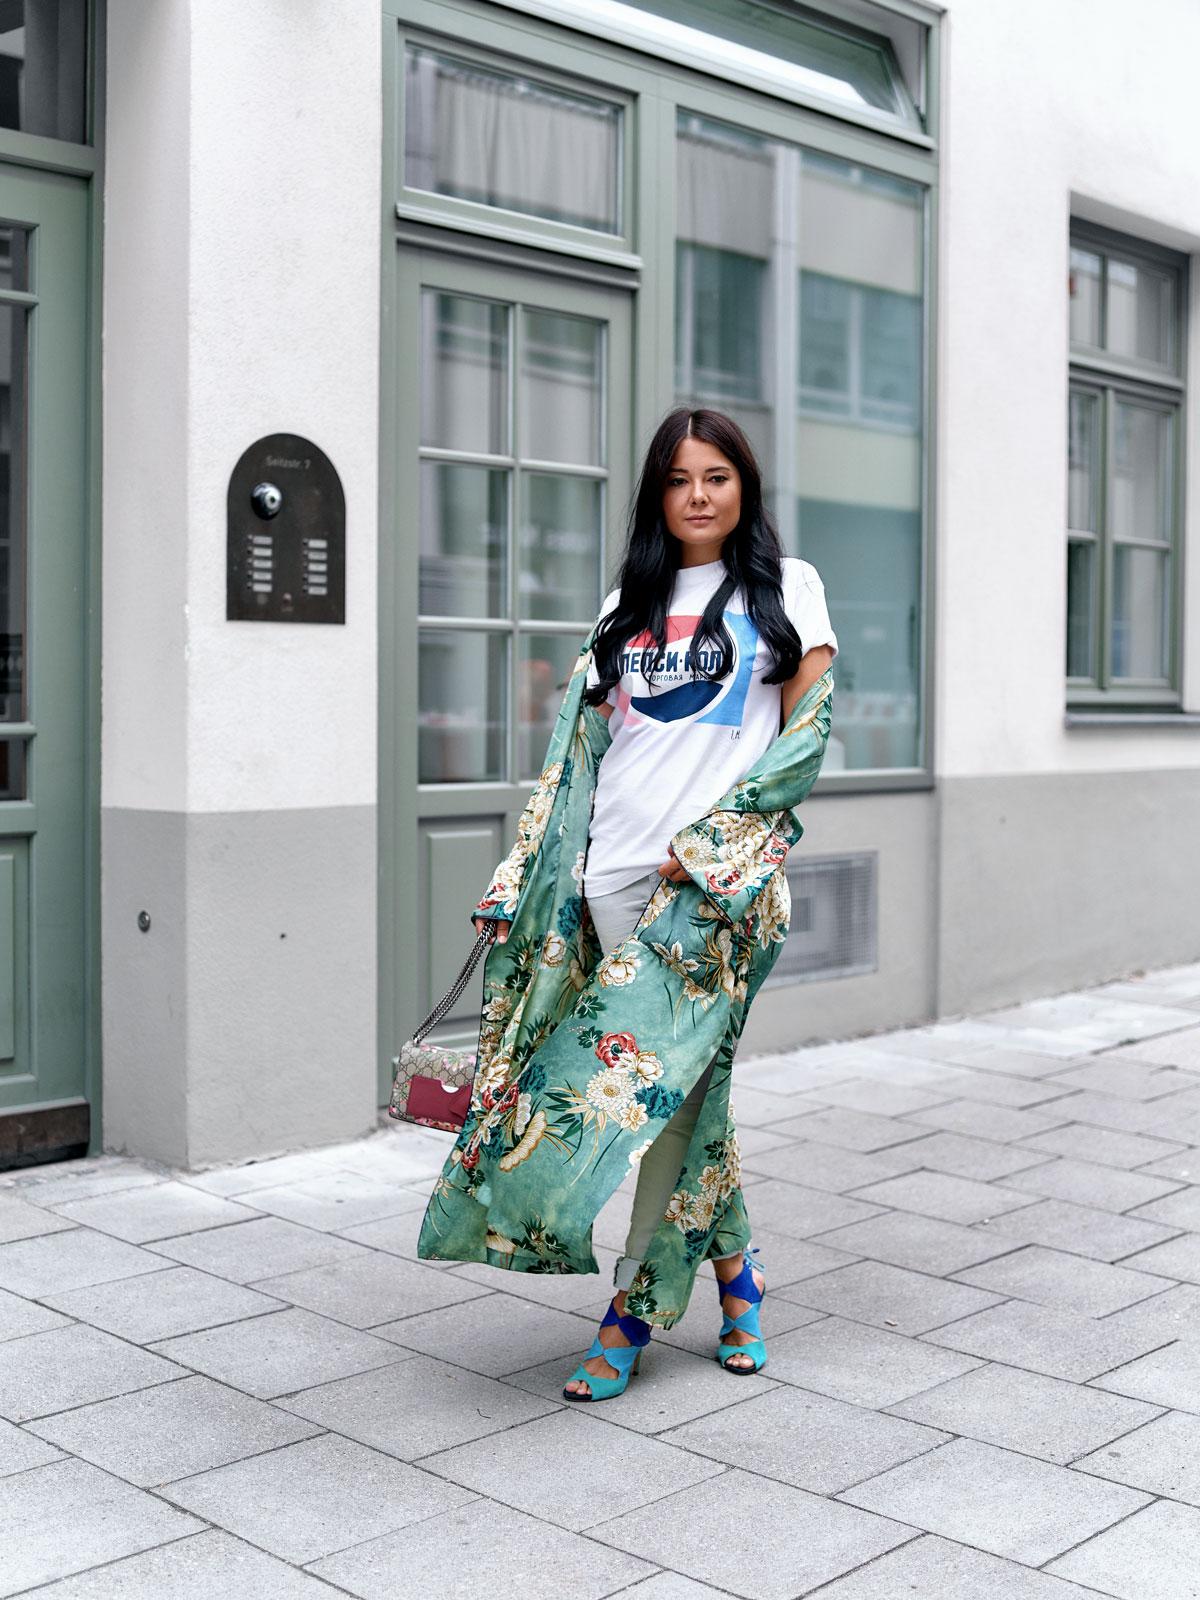 fashionambit-fashionblog-muenchen-modeblog-deutschland-blogger-modeblogger-fashionblogger-bloggerdeutschland-lifestyleblog-munich-style-blog-frauen-sommer